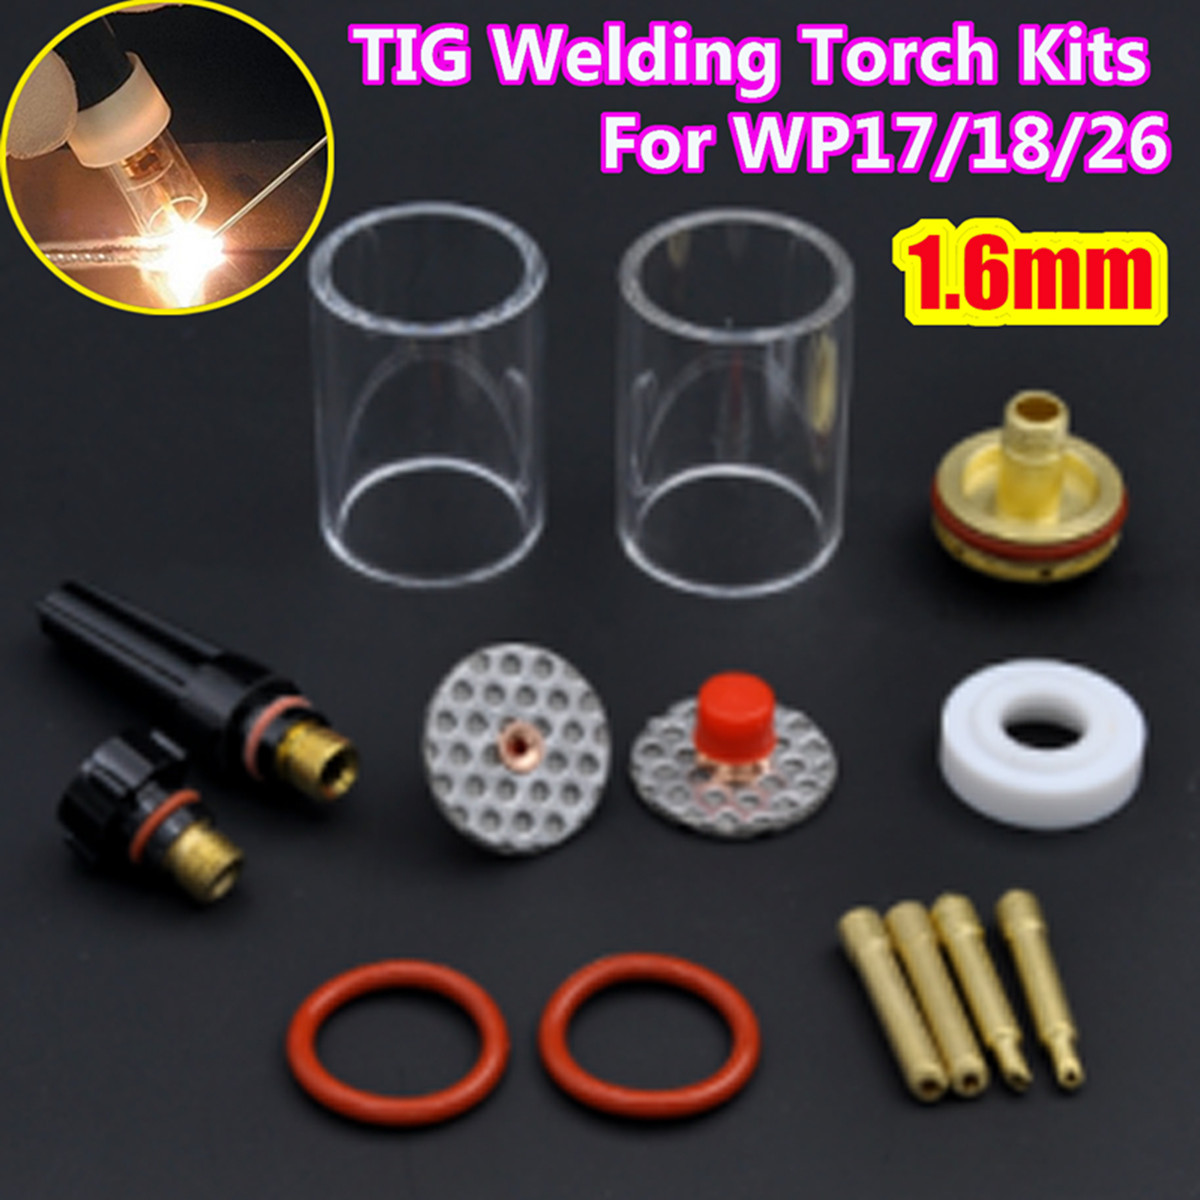 New 14PCS 1.6mm 1/16 TIG Welding Torch Stubby Gas Lens Glass Cup Kit For WP17/18/26 1set 14pcs tig welding torch stubby gas lens glass pyrex cup kit 3 2mm 1 8 for wp17 18 26 welding series